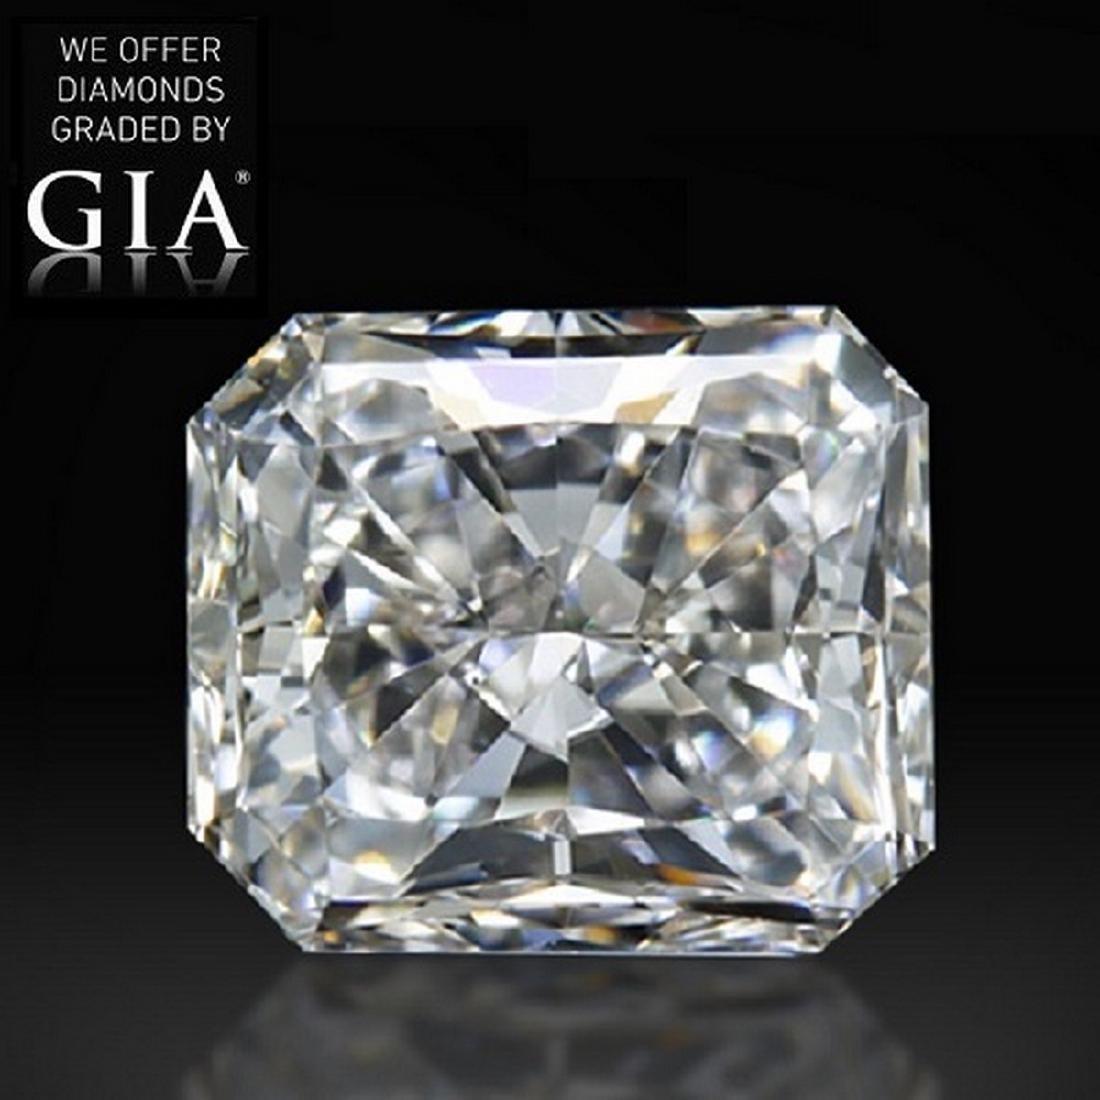 3.02 ct, Color I/VVS2 , Radiant cut Diamond